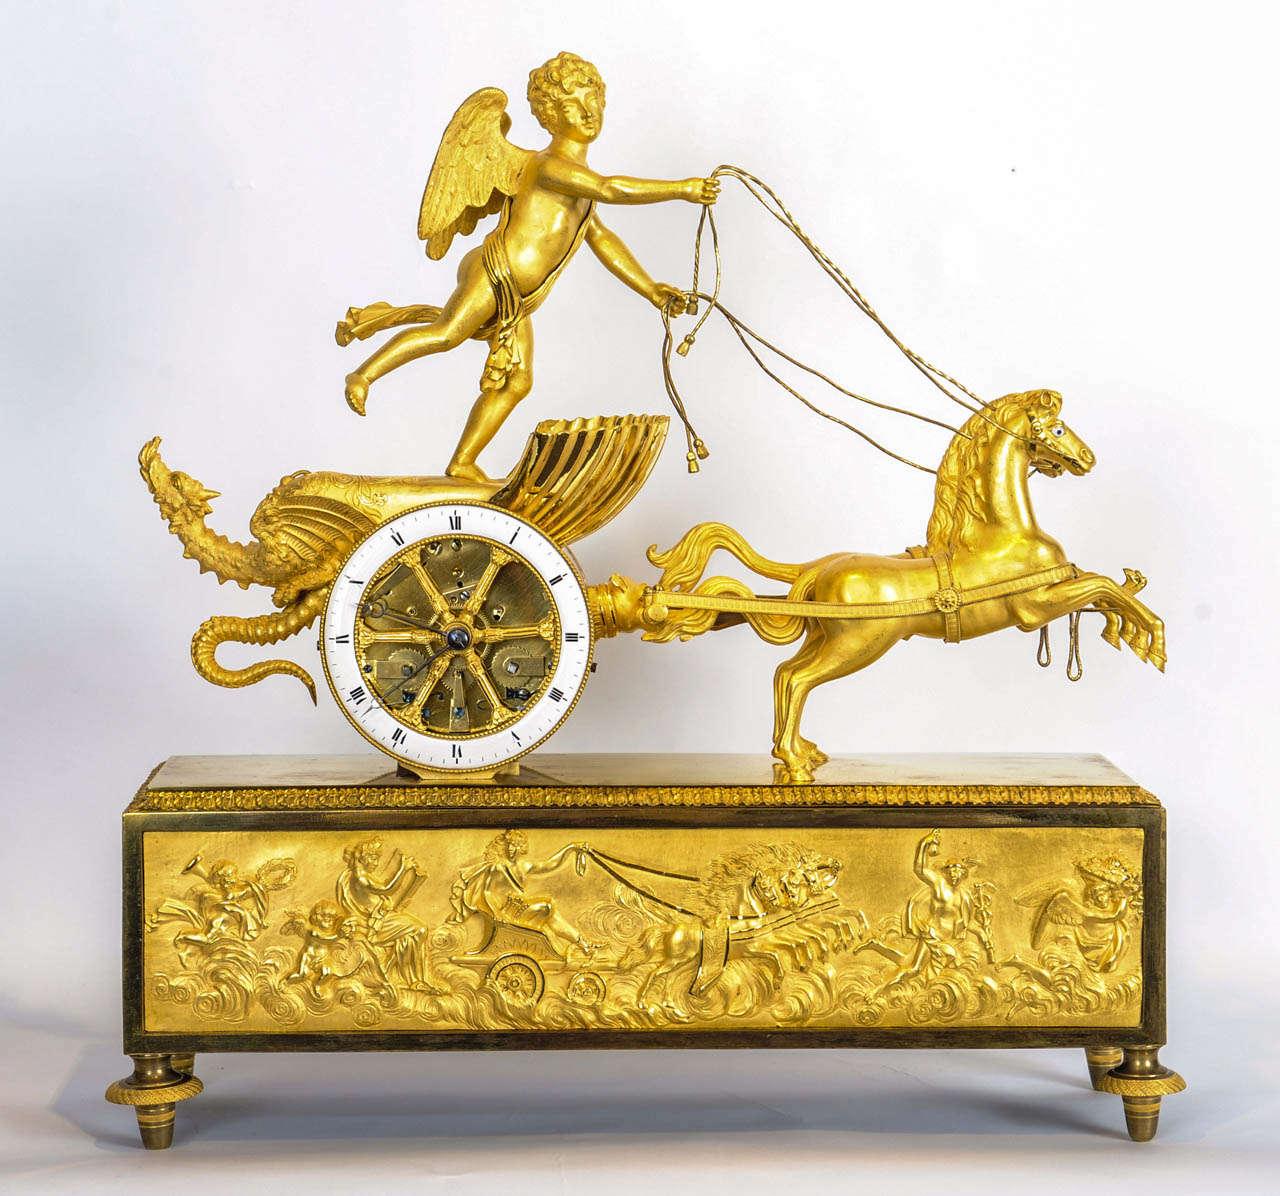 A Charming French Empire Ormolu Chariot Clock Circa 1810